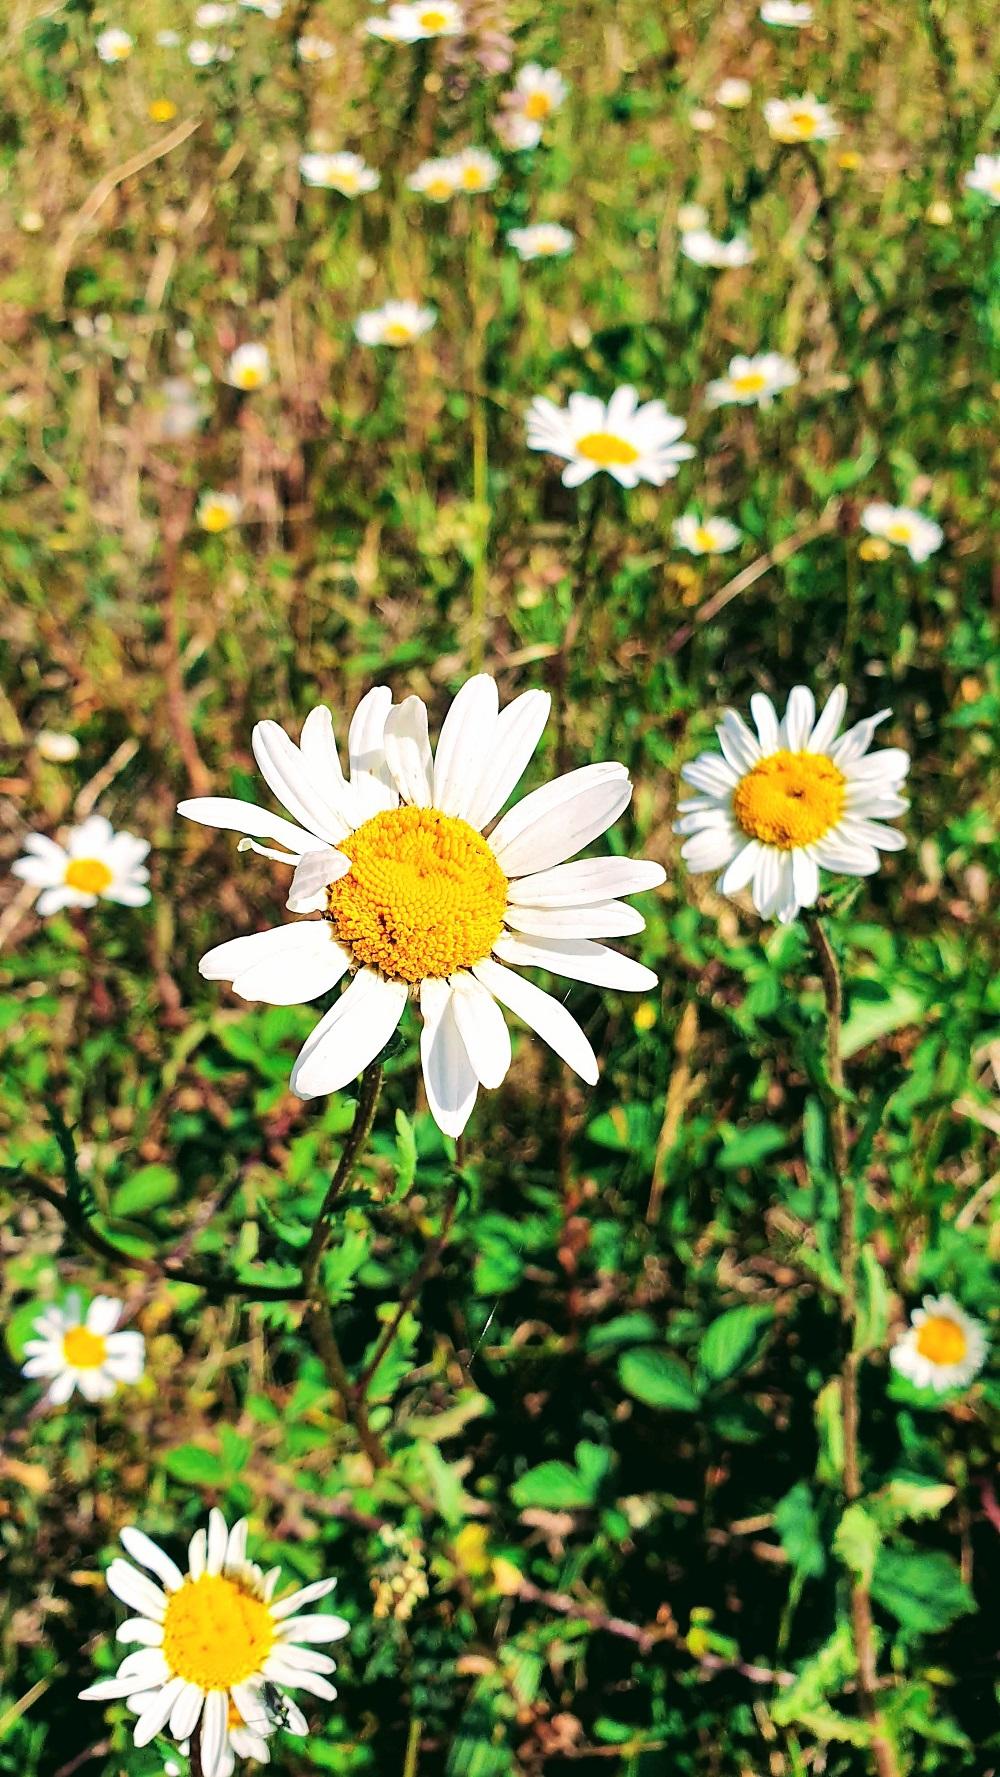 Let Us Dance In The Sun, Wearing Wild Flowers